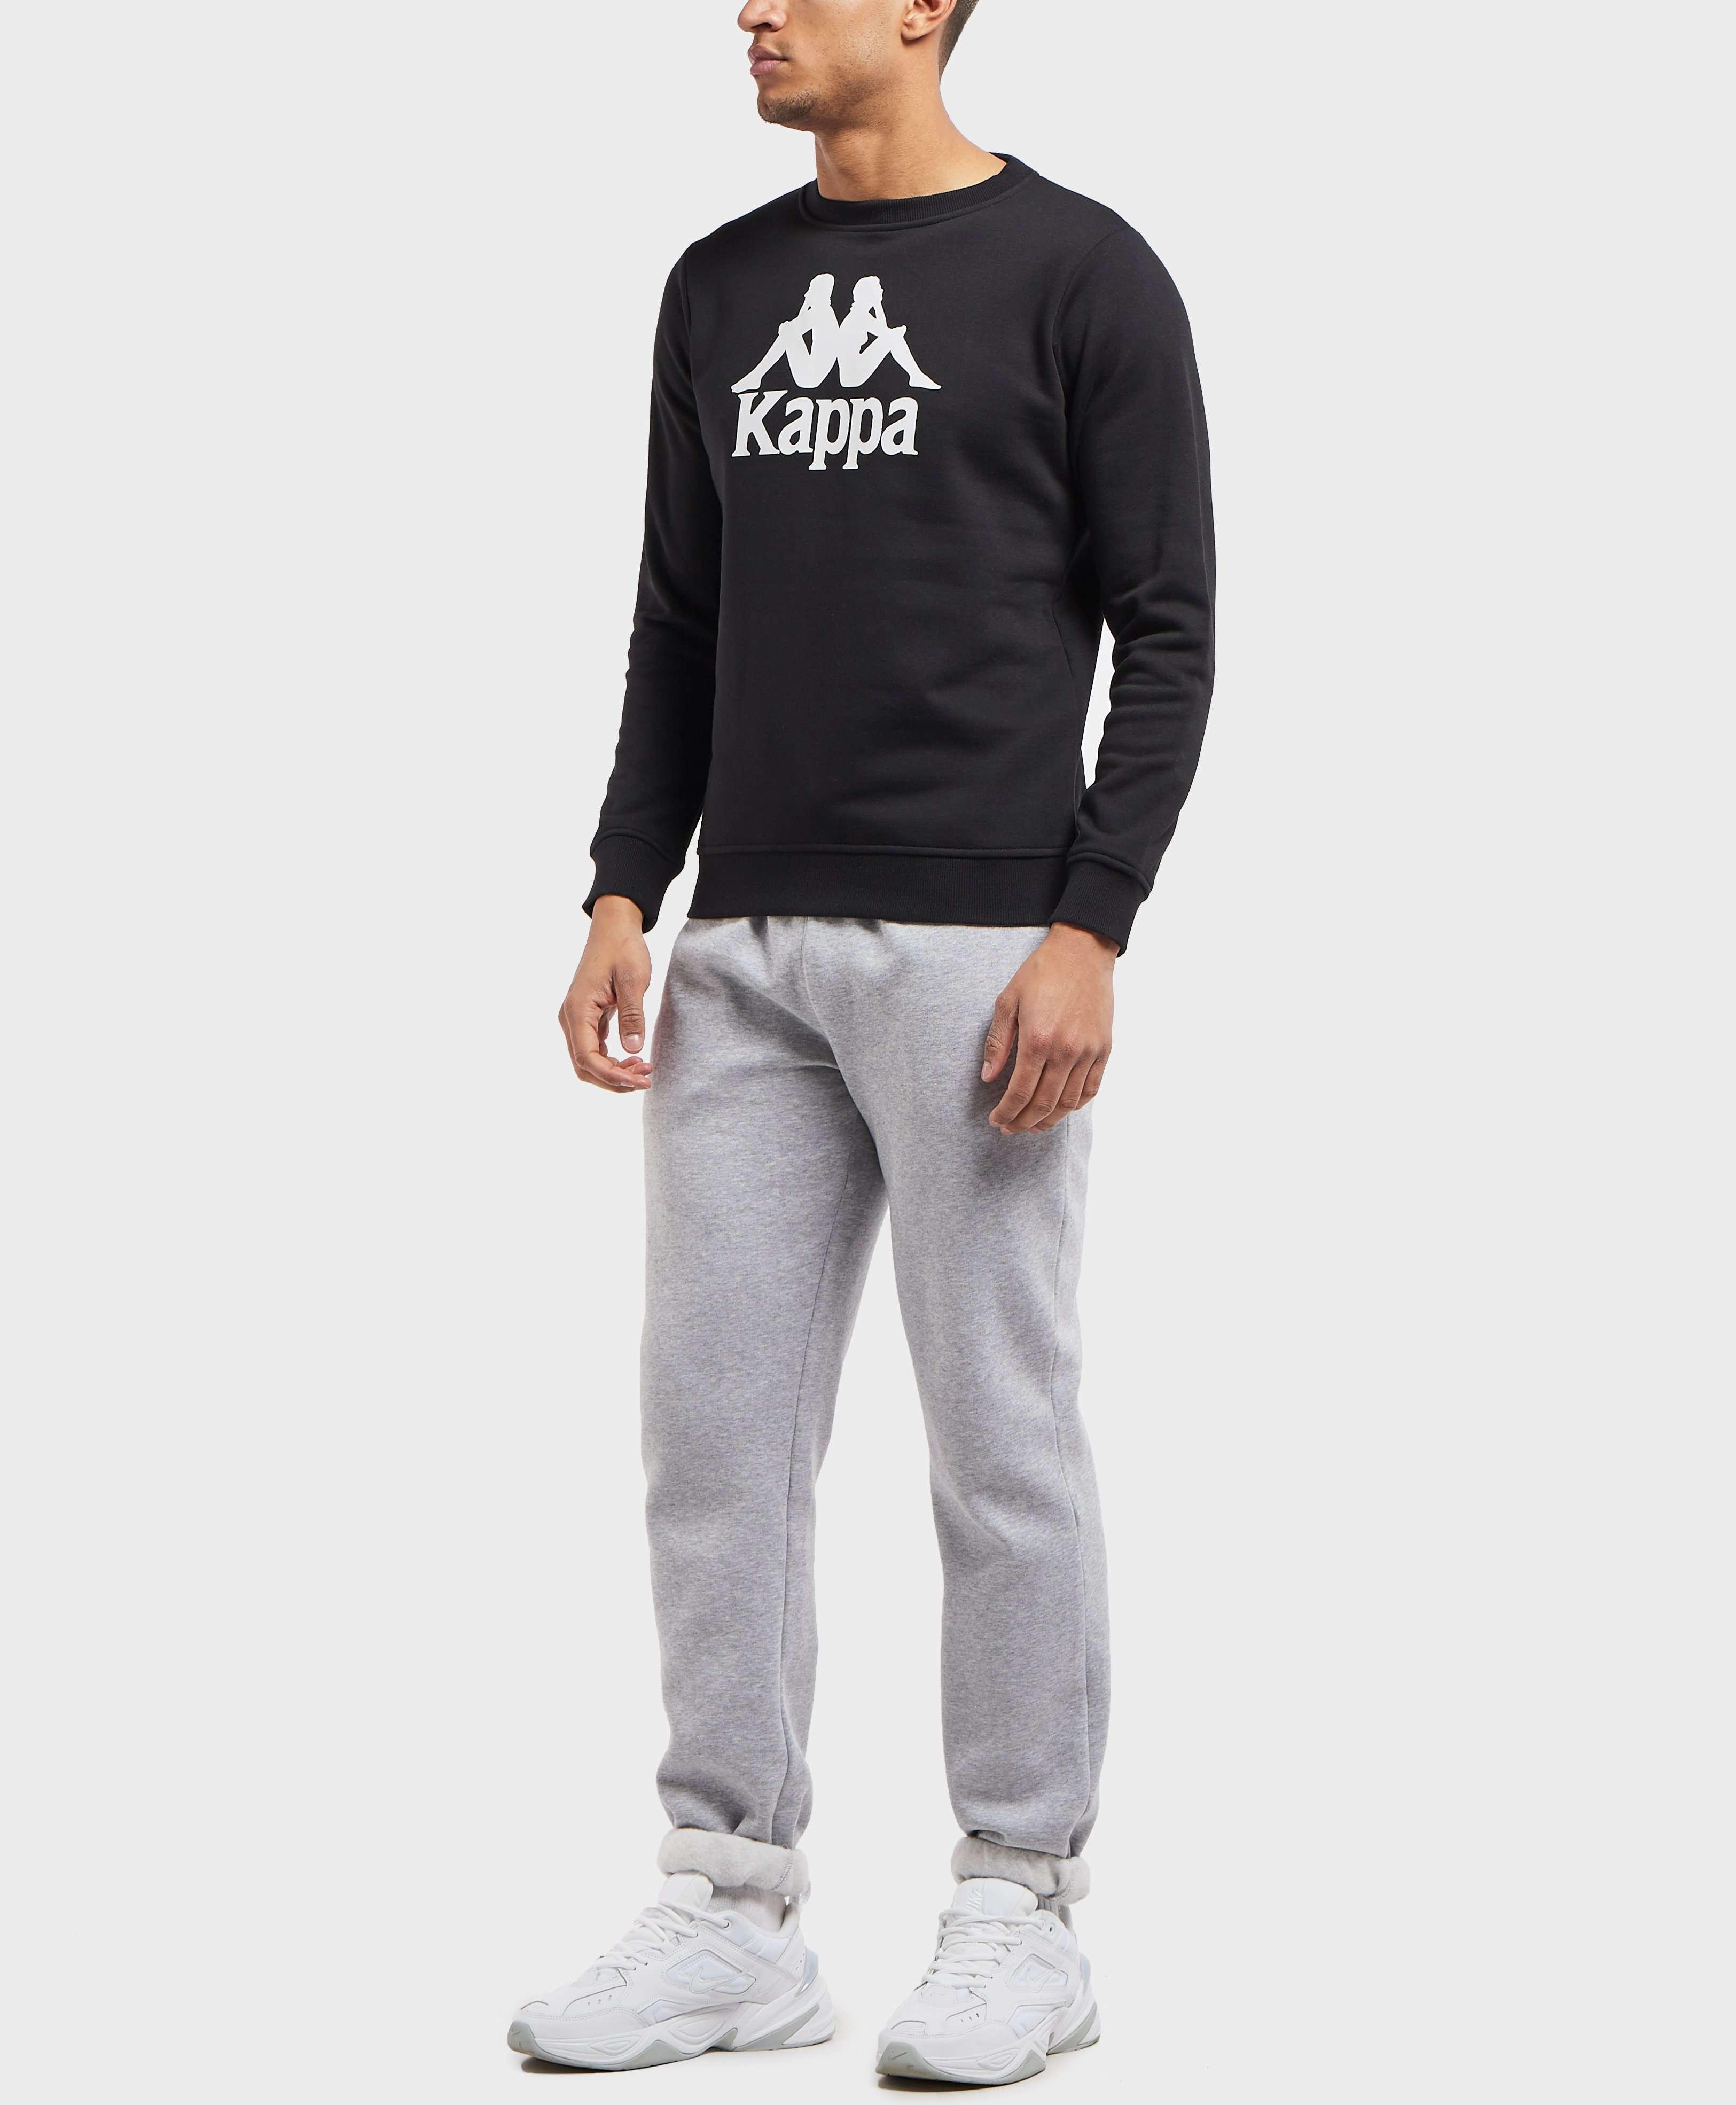 Kappa Authentic Logo Sweatshirt